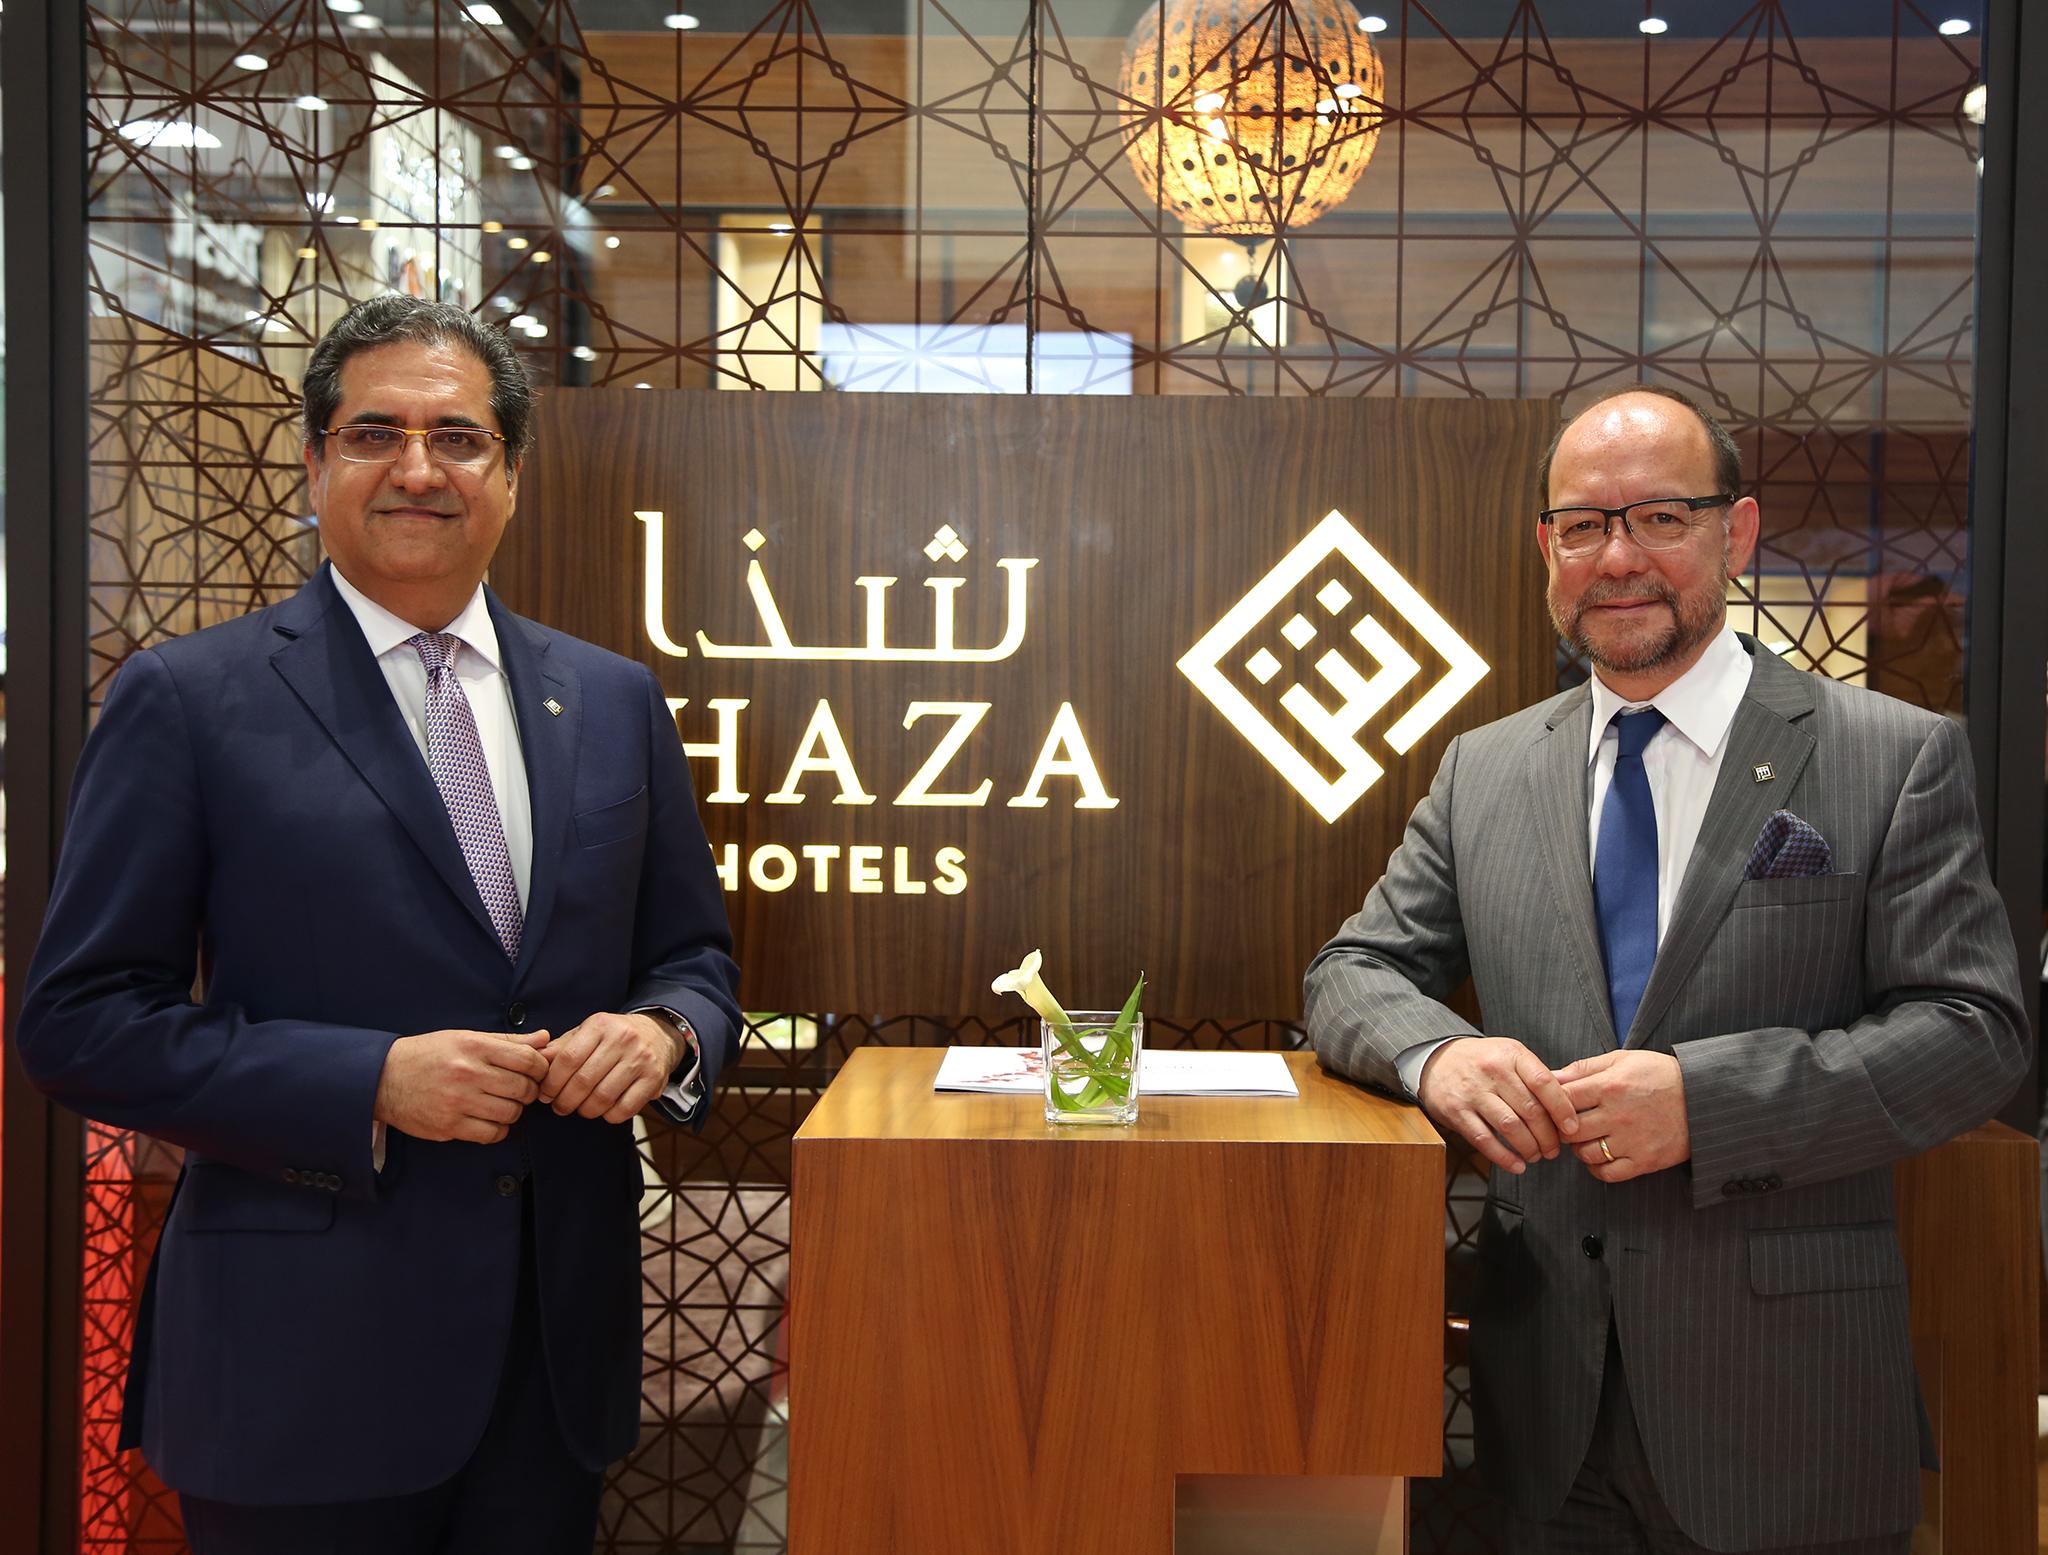 Mr. Simon Coombs President and CEO of Shaza Hotels and Mr. Sanjiv Malhotra, Executive Vice President for Shaza Hotels